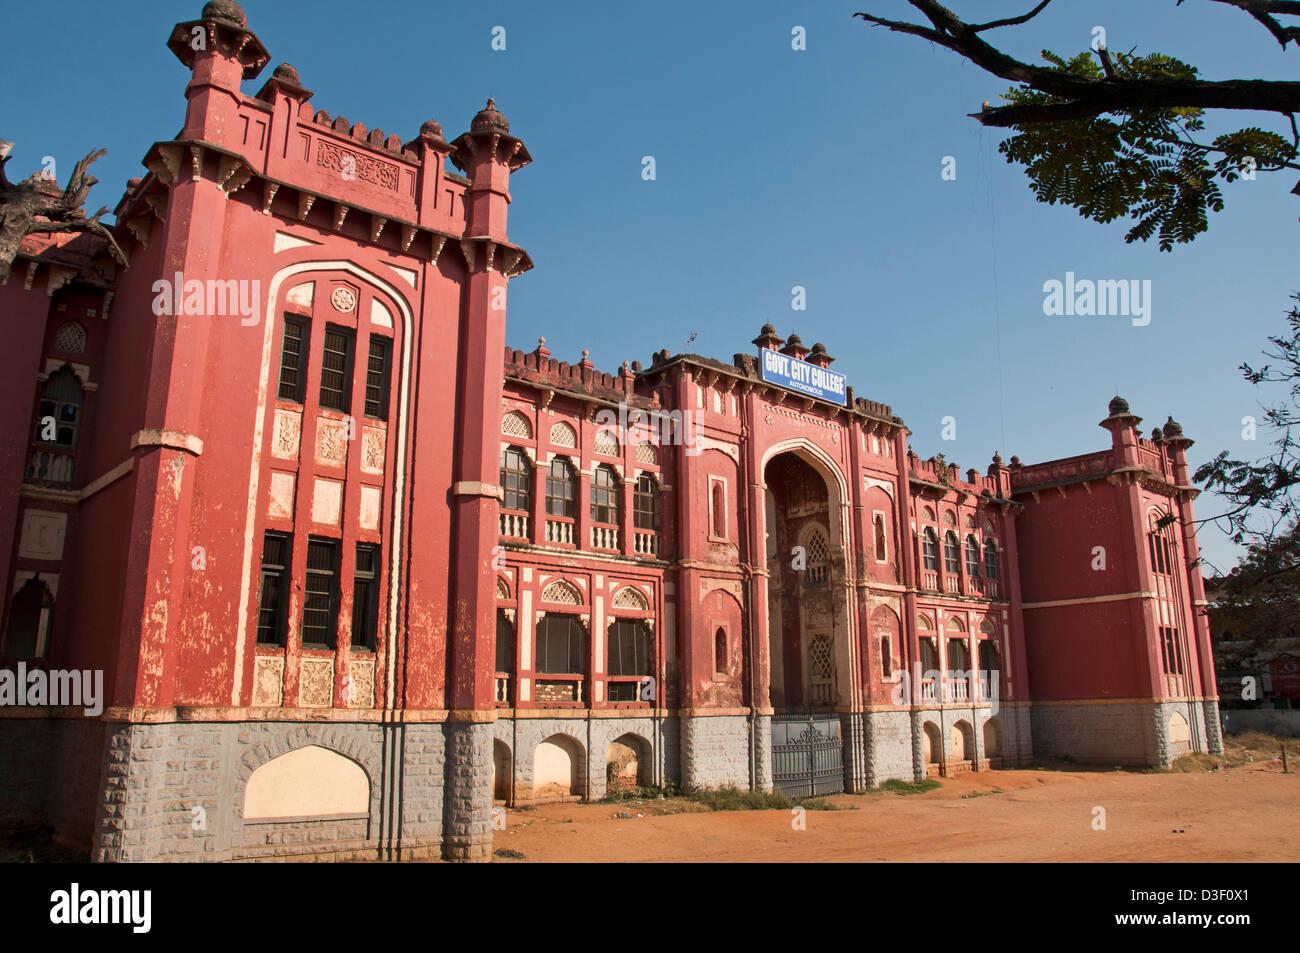 Regierung City College autonomen Hyderabad Indien Andhra Pradesh Stockbild